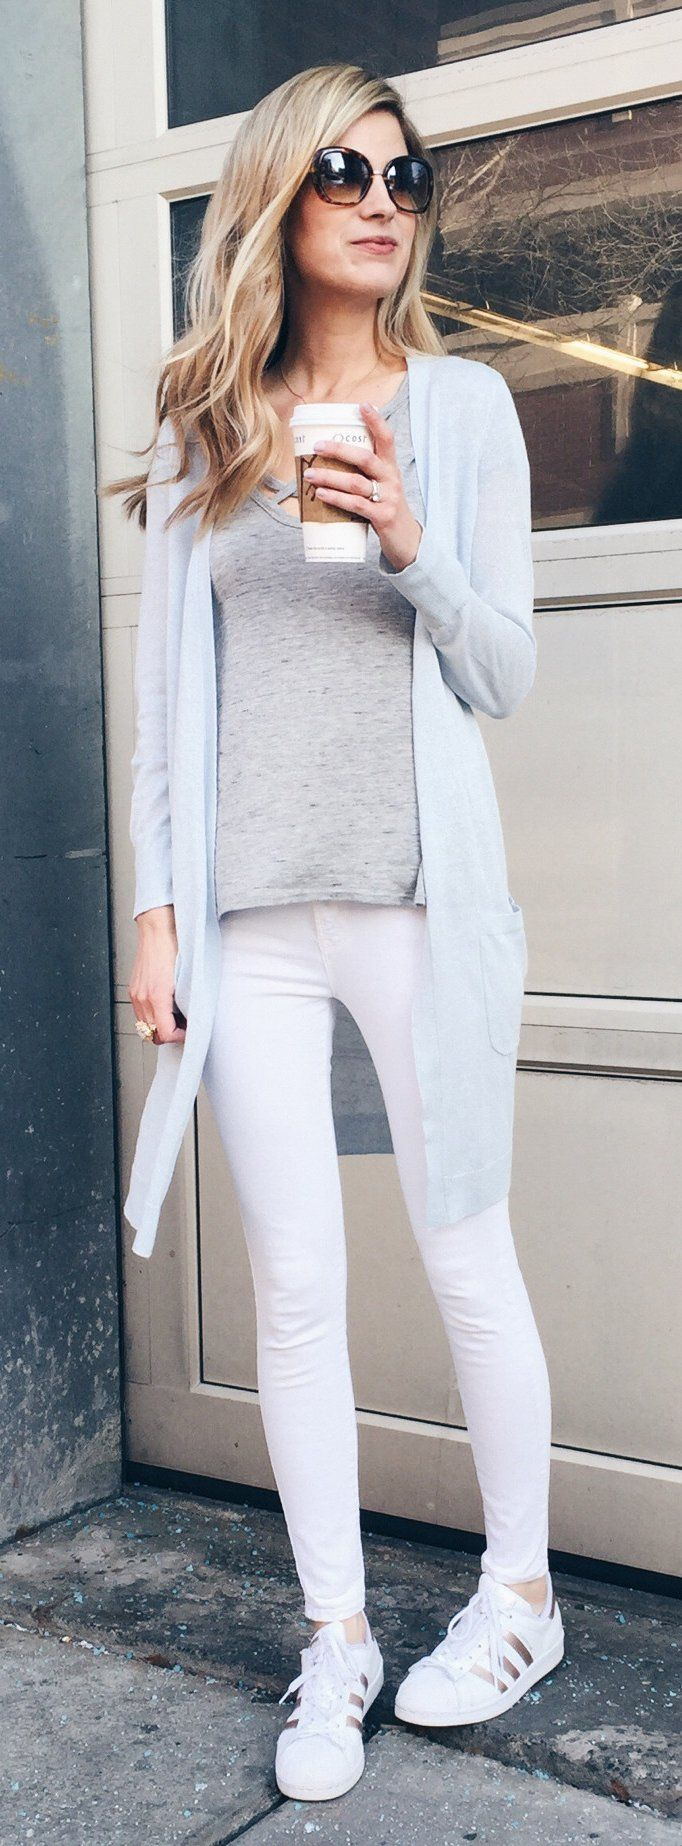 Grey Cardigan & Grey Top & White Skinny Jeans & White Adidas Pumps